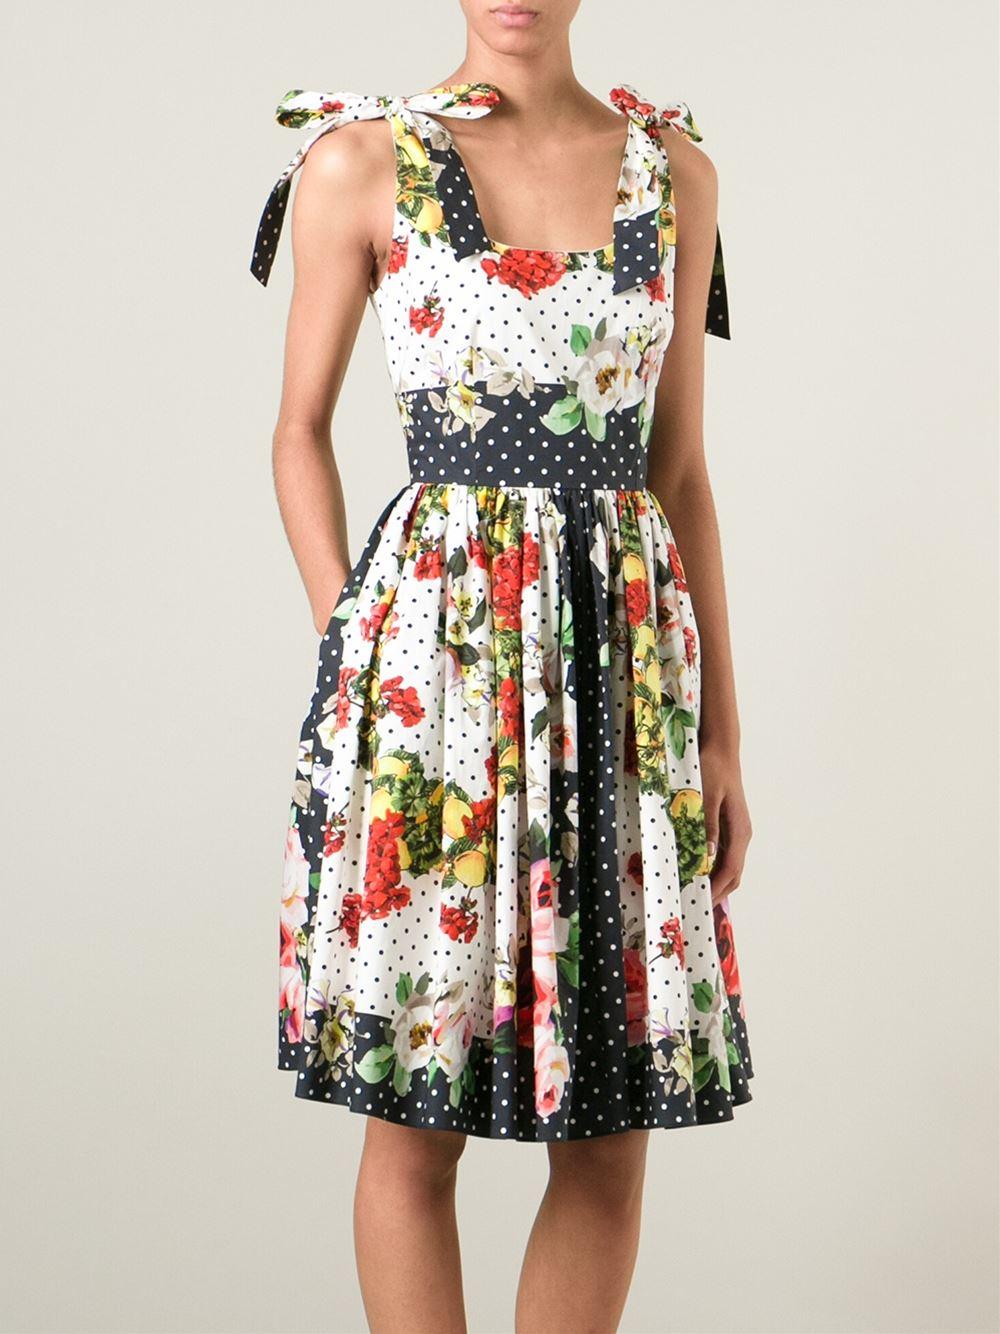 Fashion For Linda Dolce And Gabbana Lemons Polka Dot